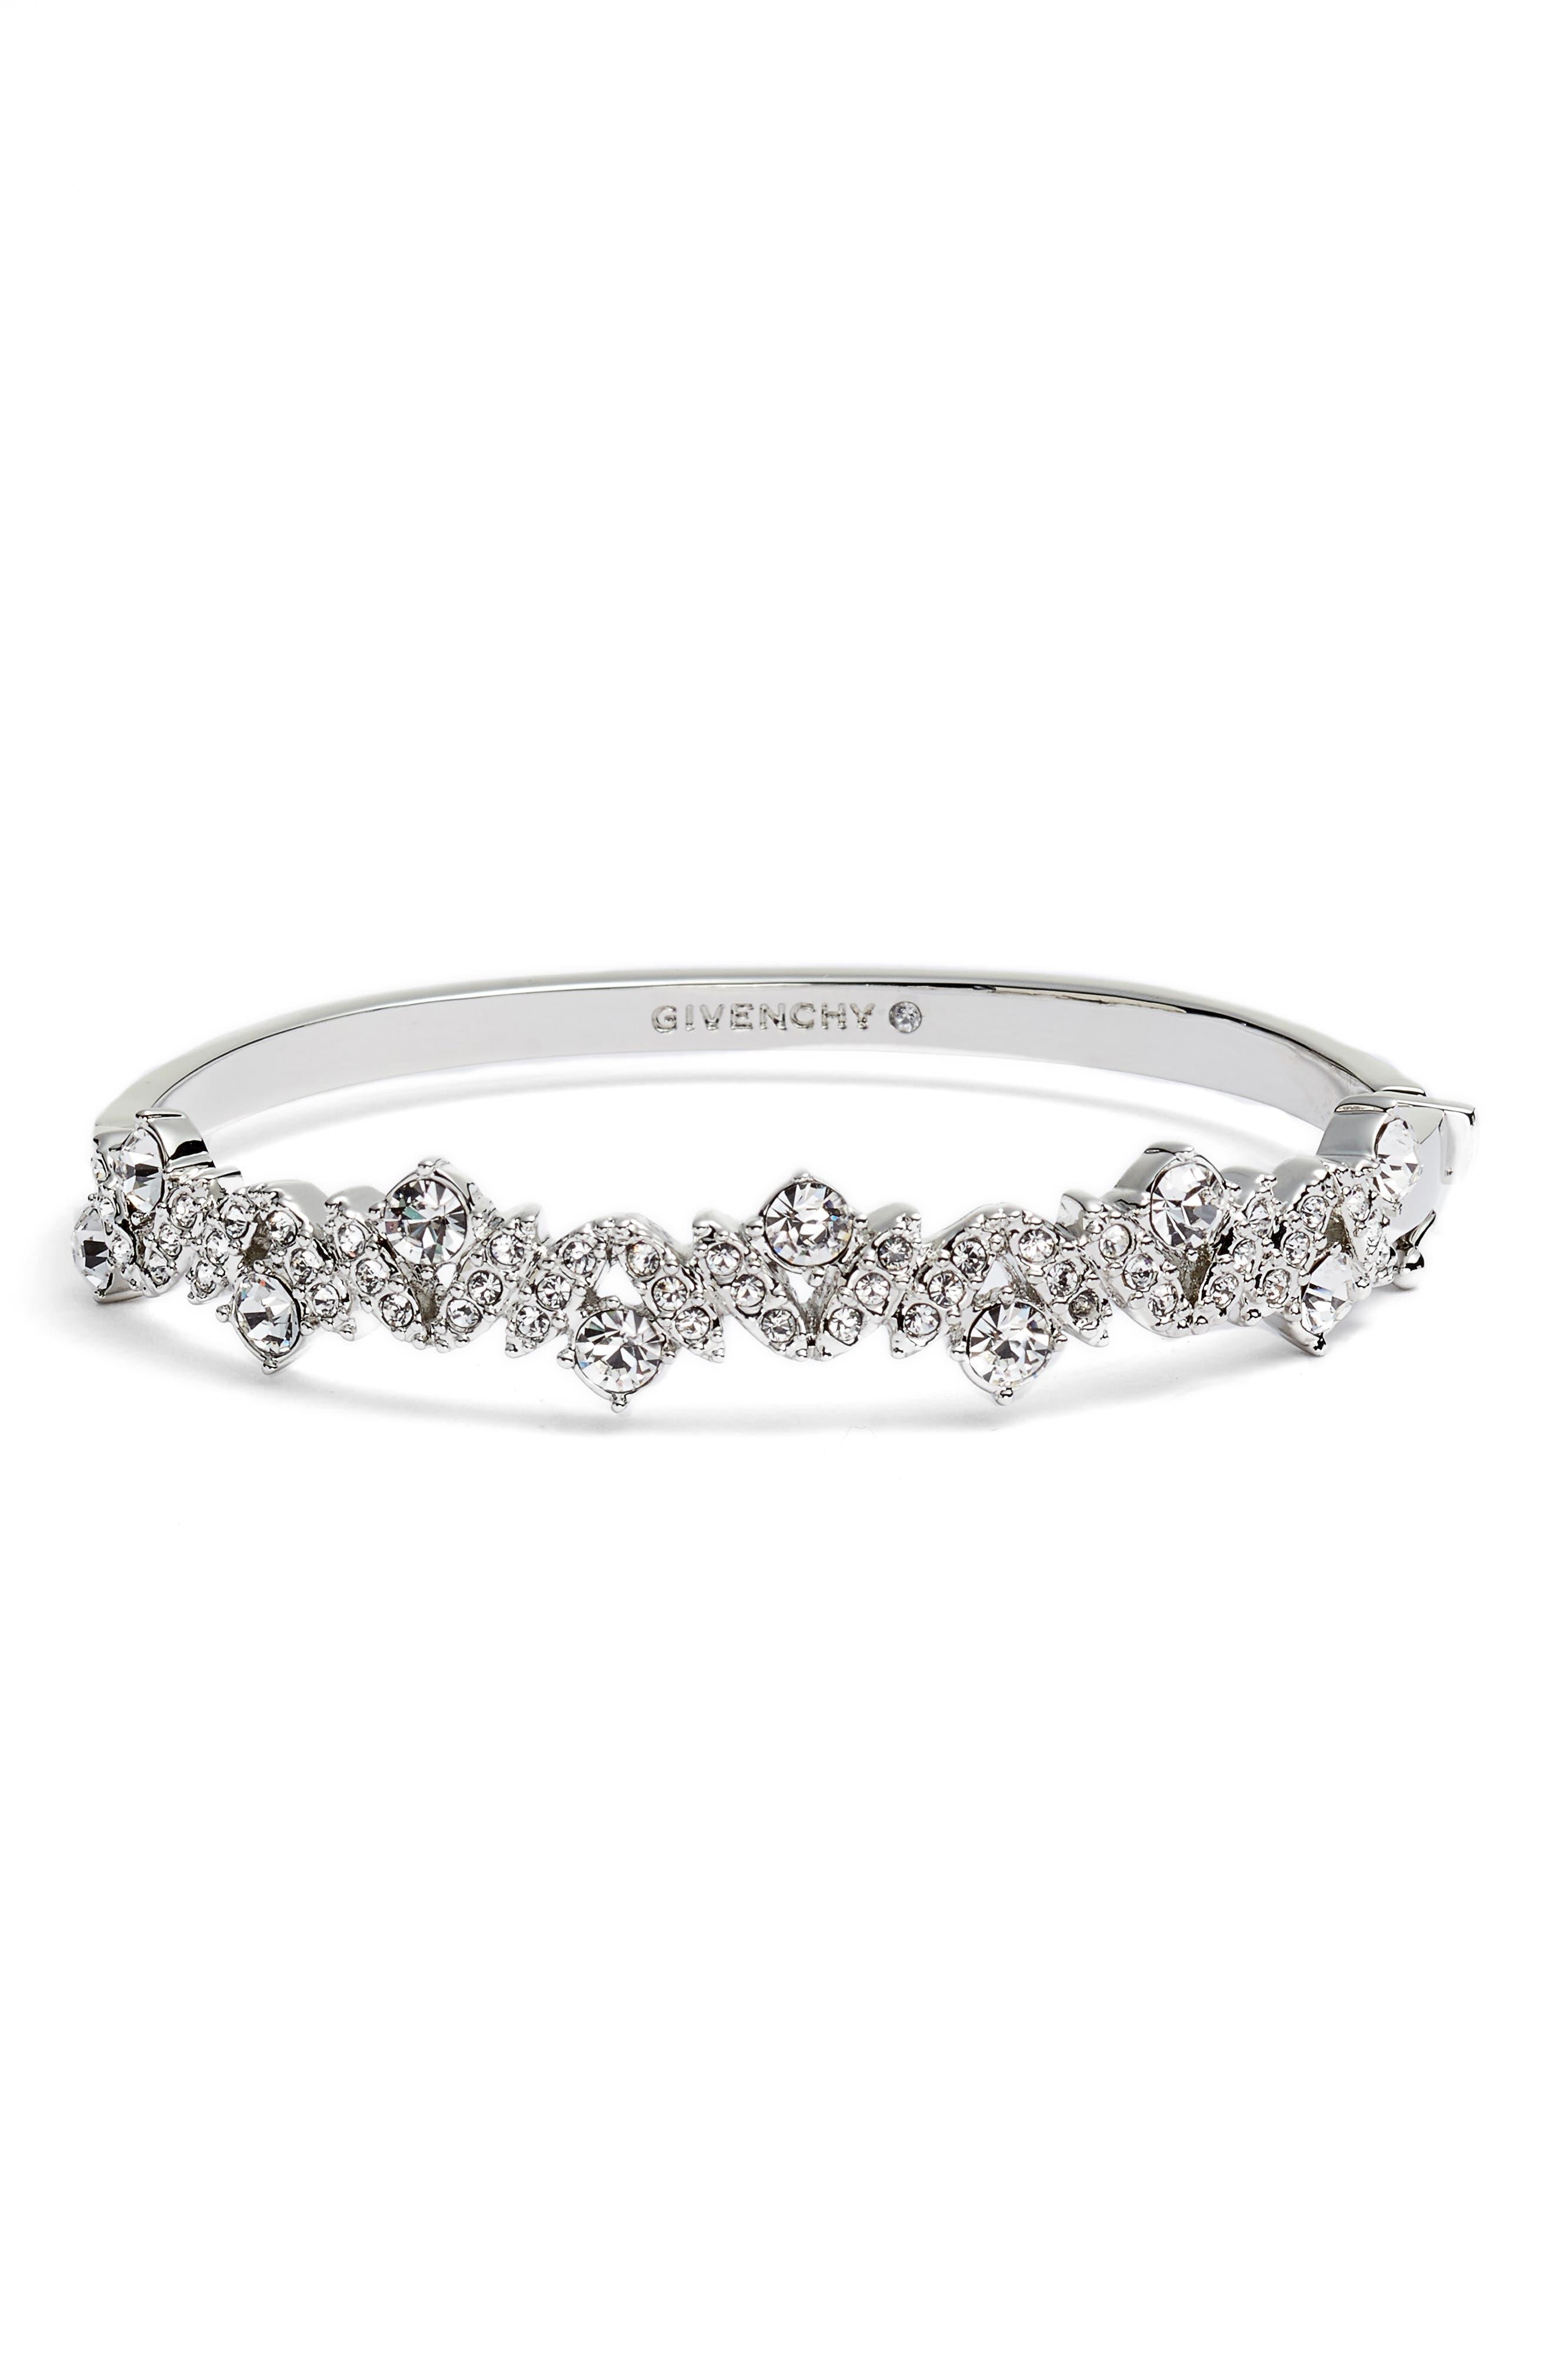 Givenchy Crystal Bangle